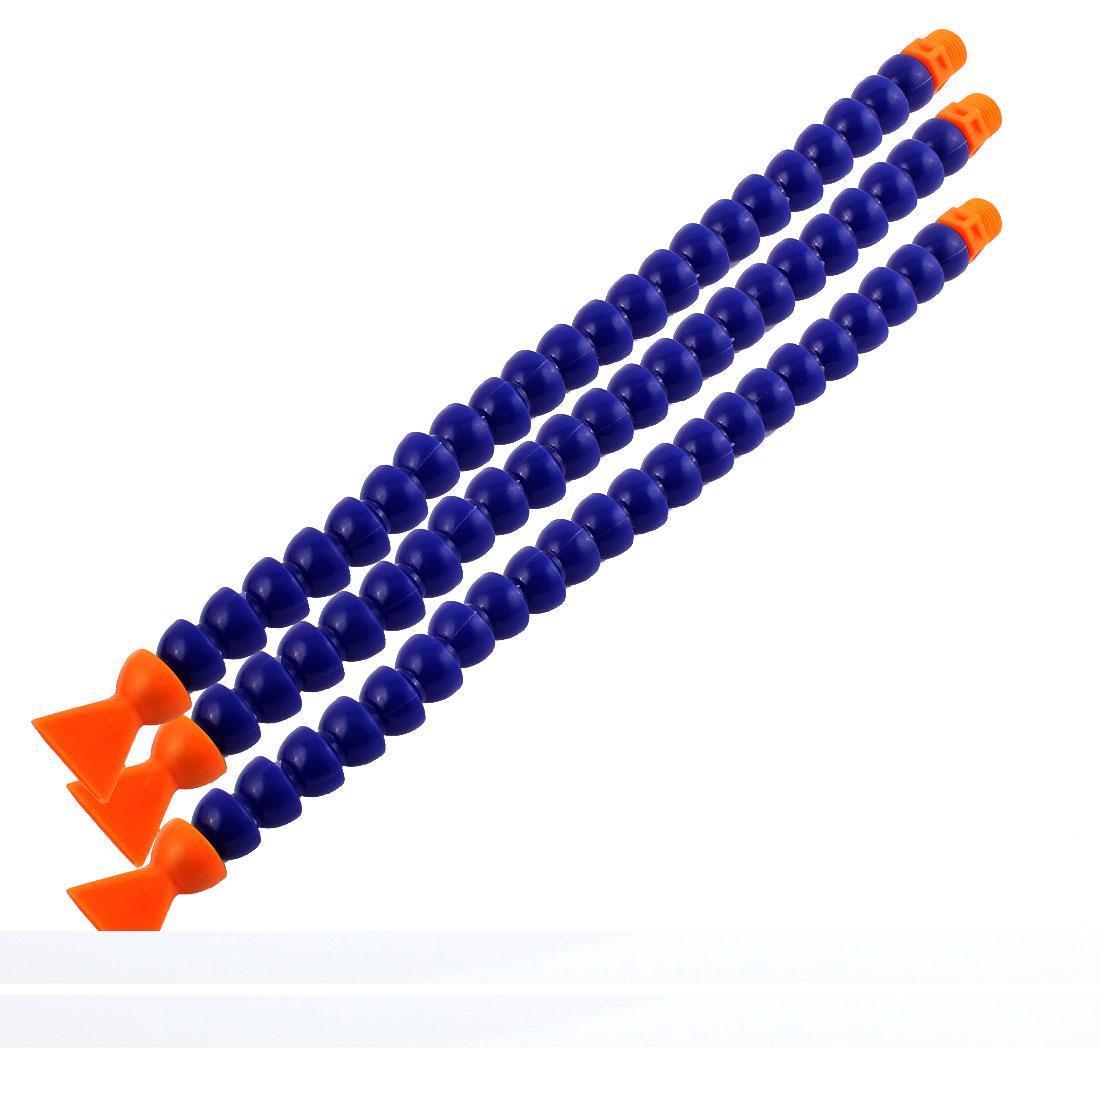 3 Pcs 30cm Length Flexible Flat Spout Cooling Oil Tube Pipe Blue